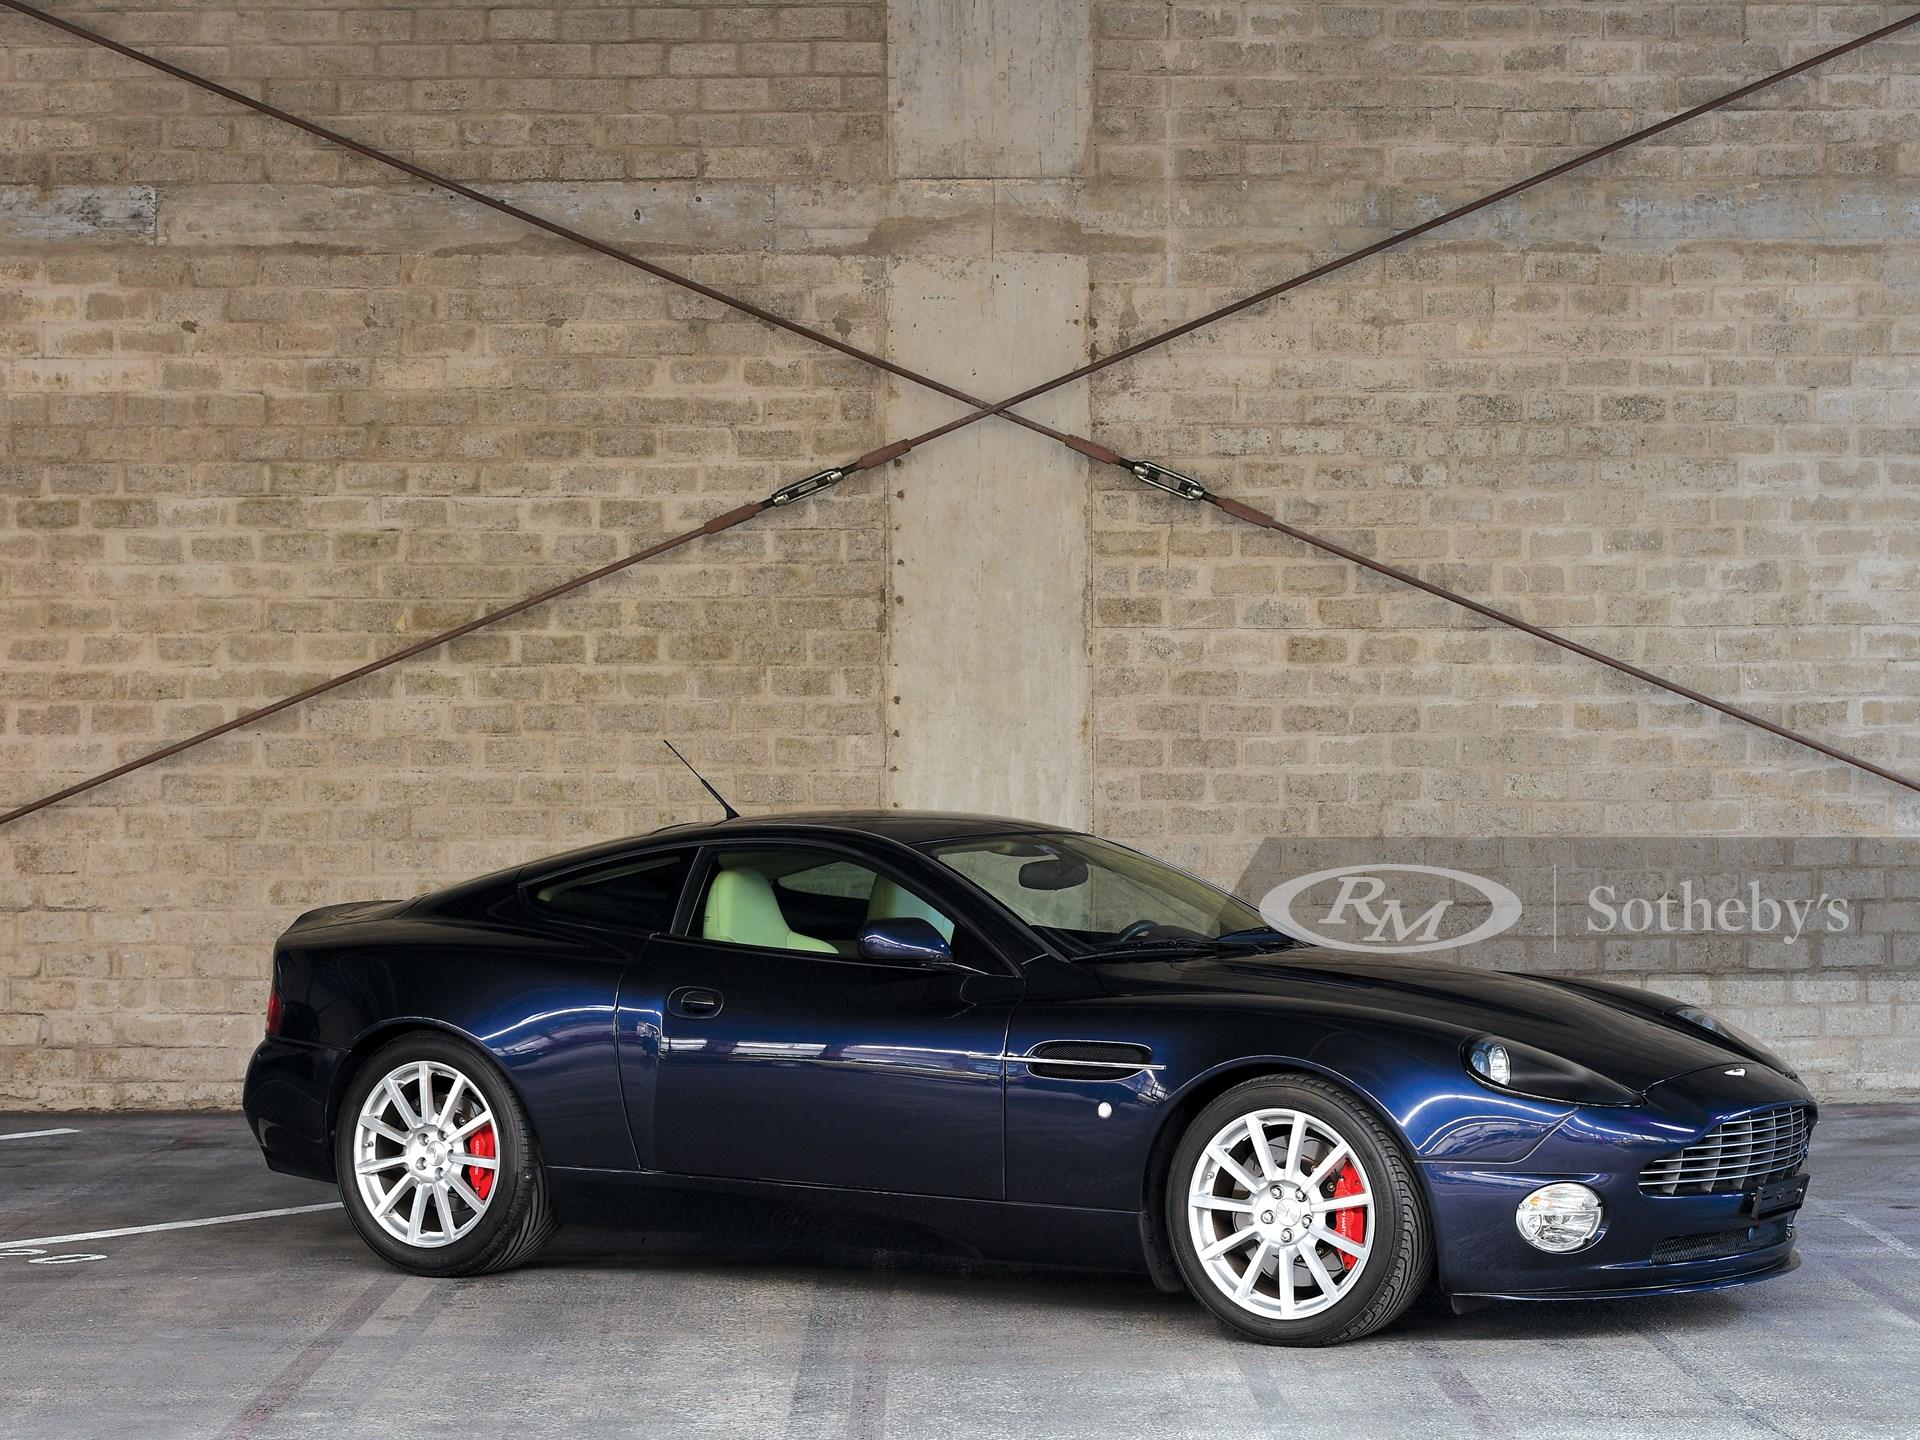 2007 Aston Martin Vanquish S Paris 2019 Rm Sotheby S